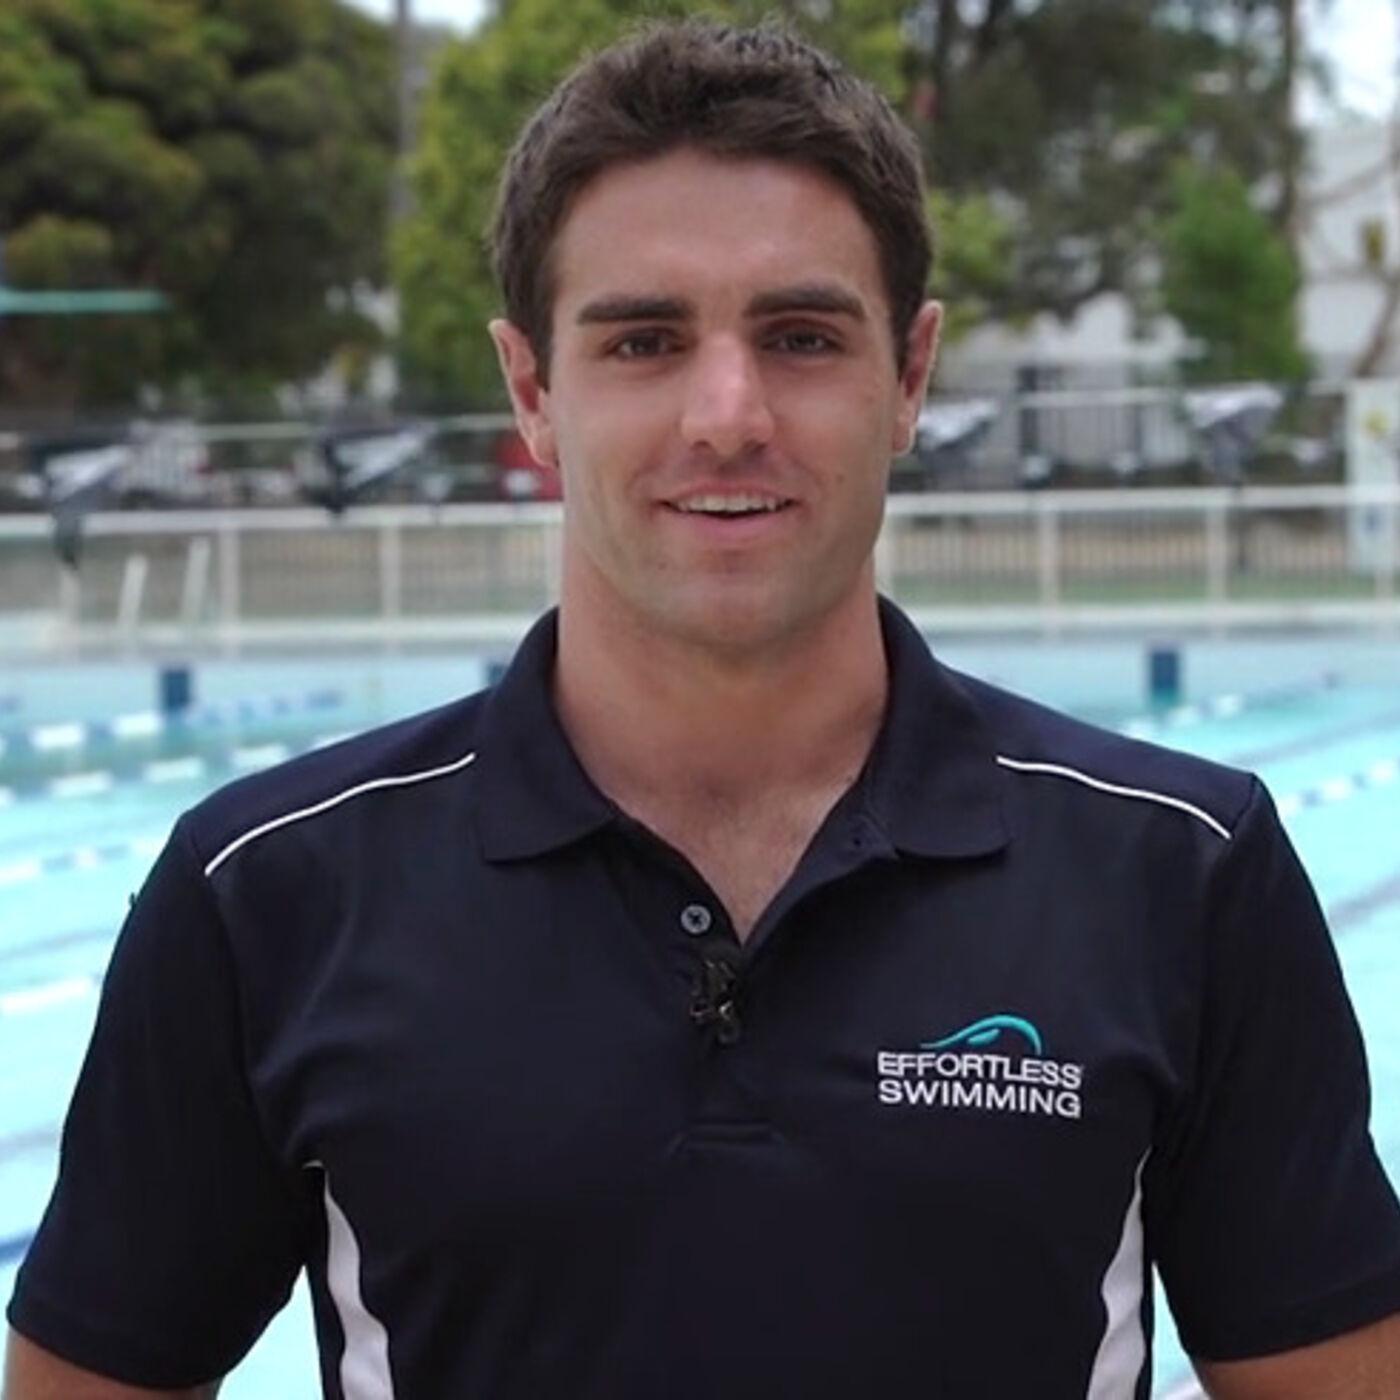 Brenton Ford's Marathon Swim Story